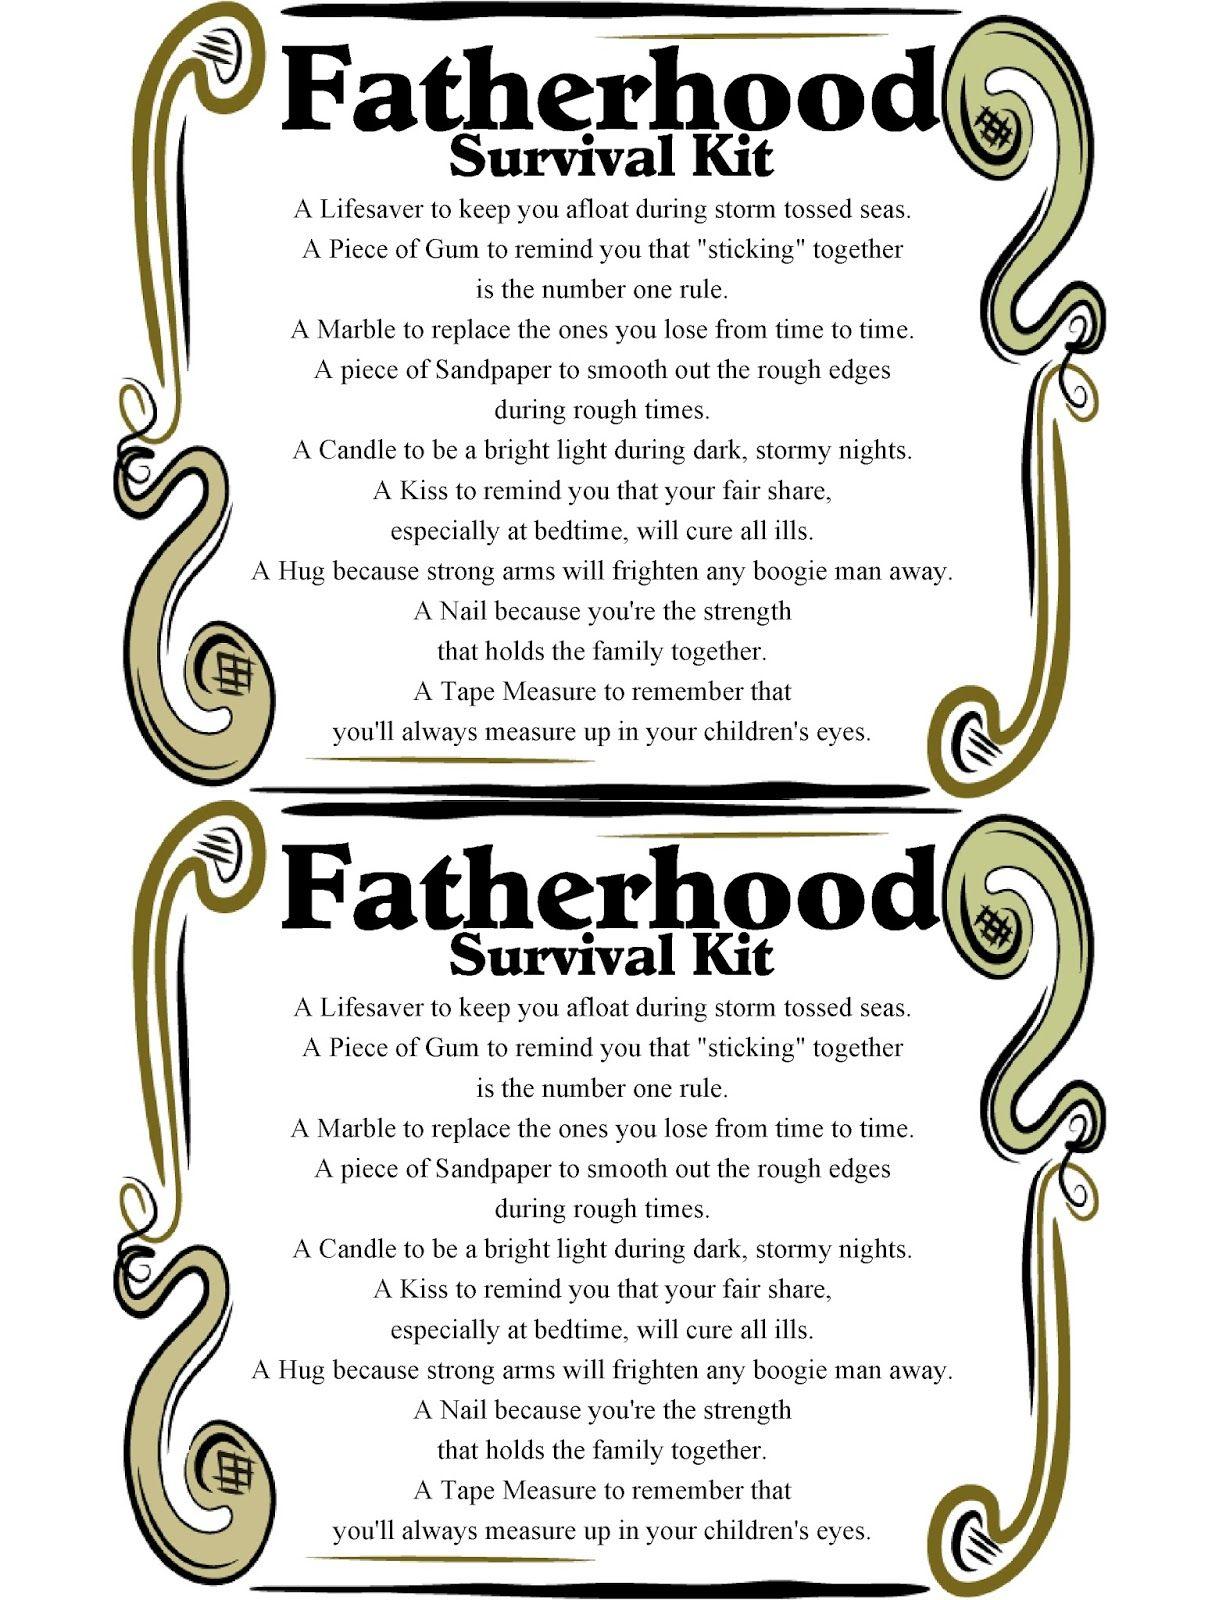 Fatherhood Survival Kit Printable